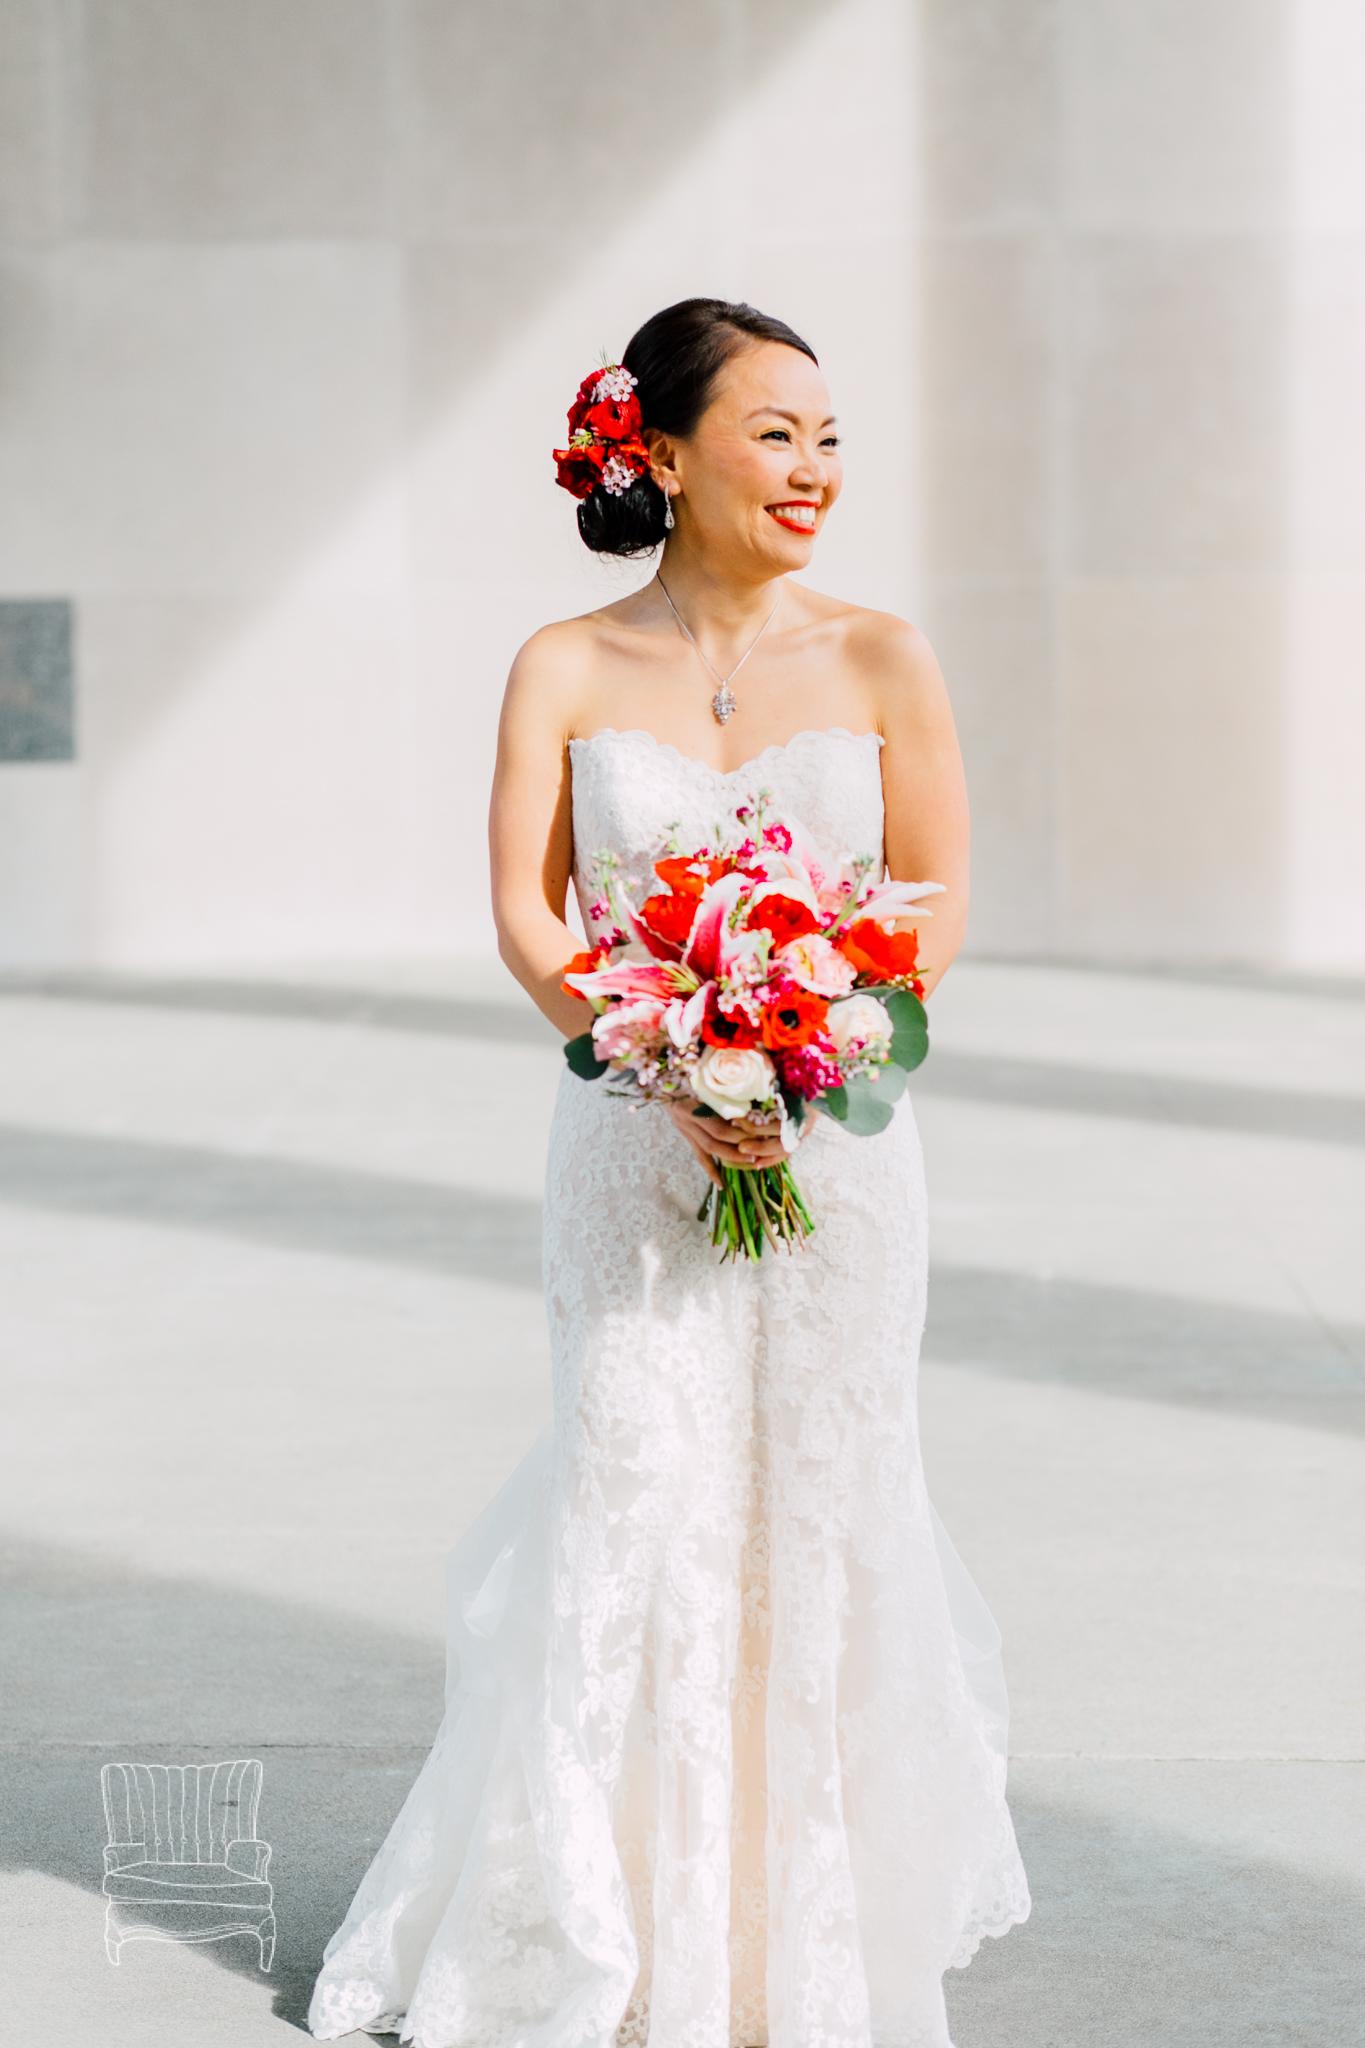 seattle-wedding-photographer-kartheryn-moran-yovithomas-5.JPG